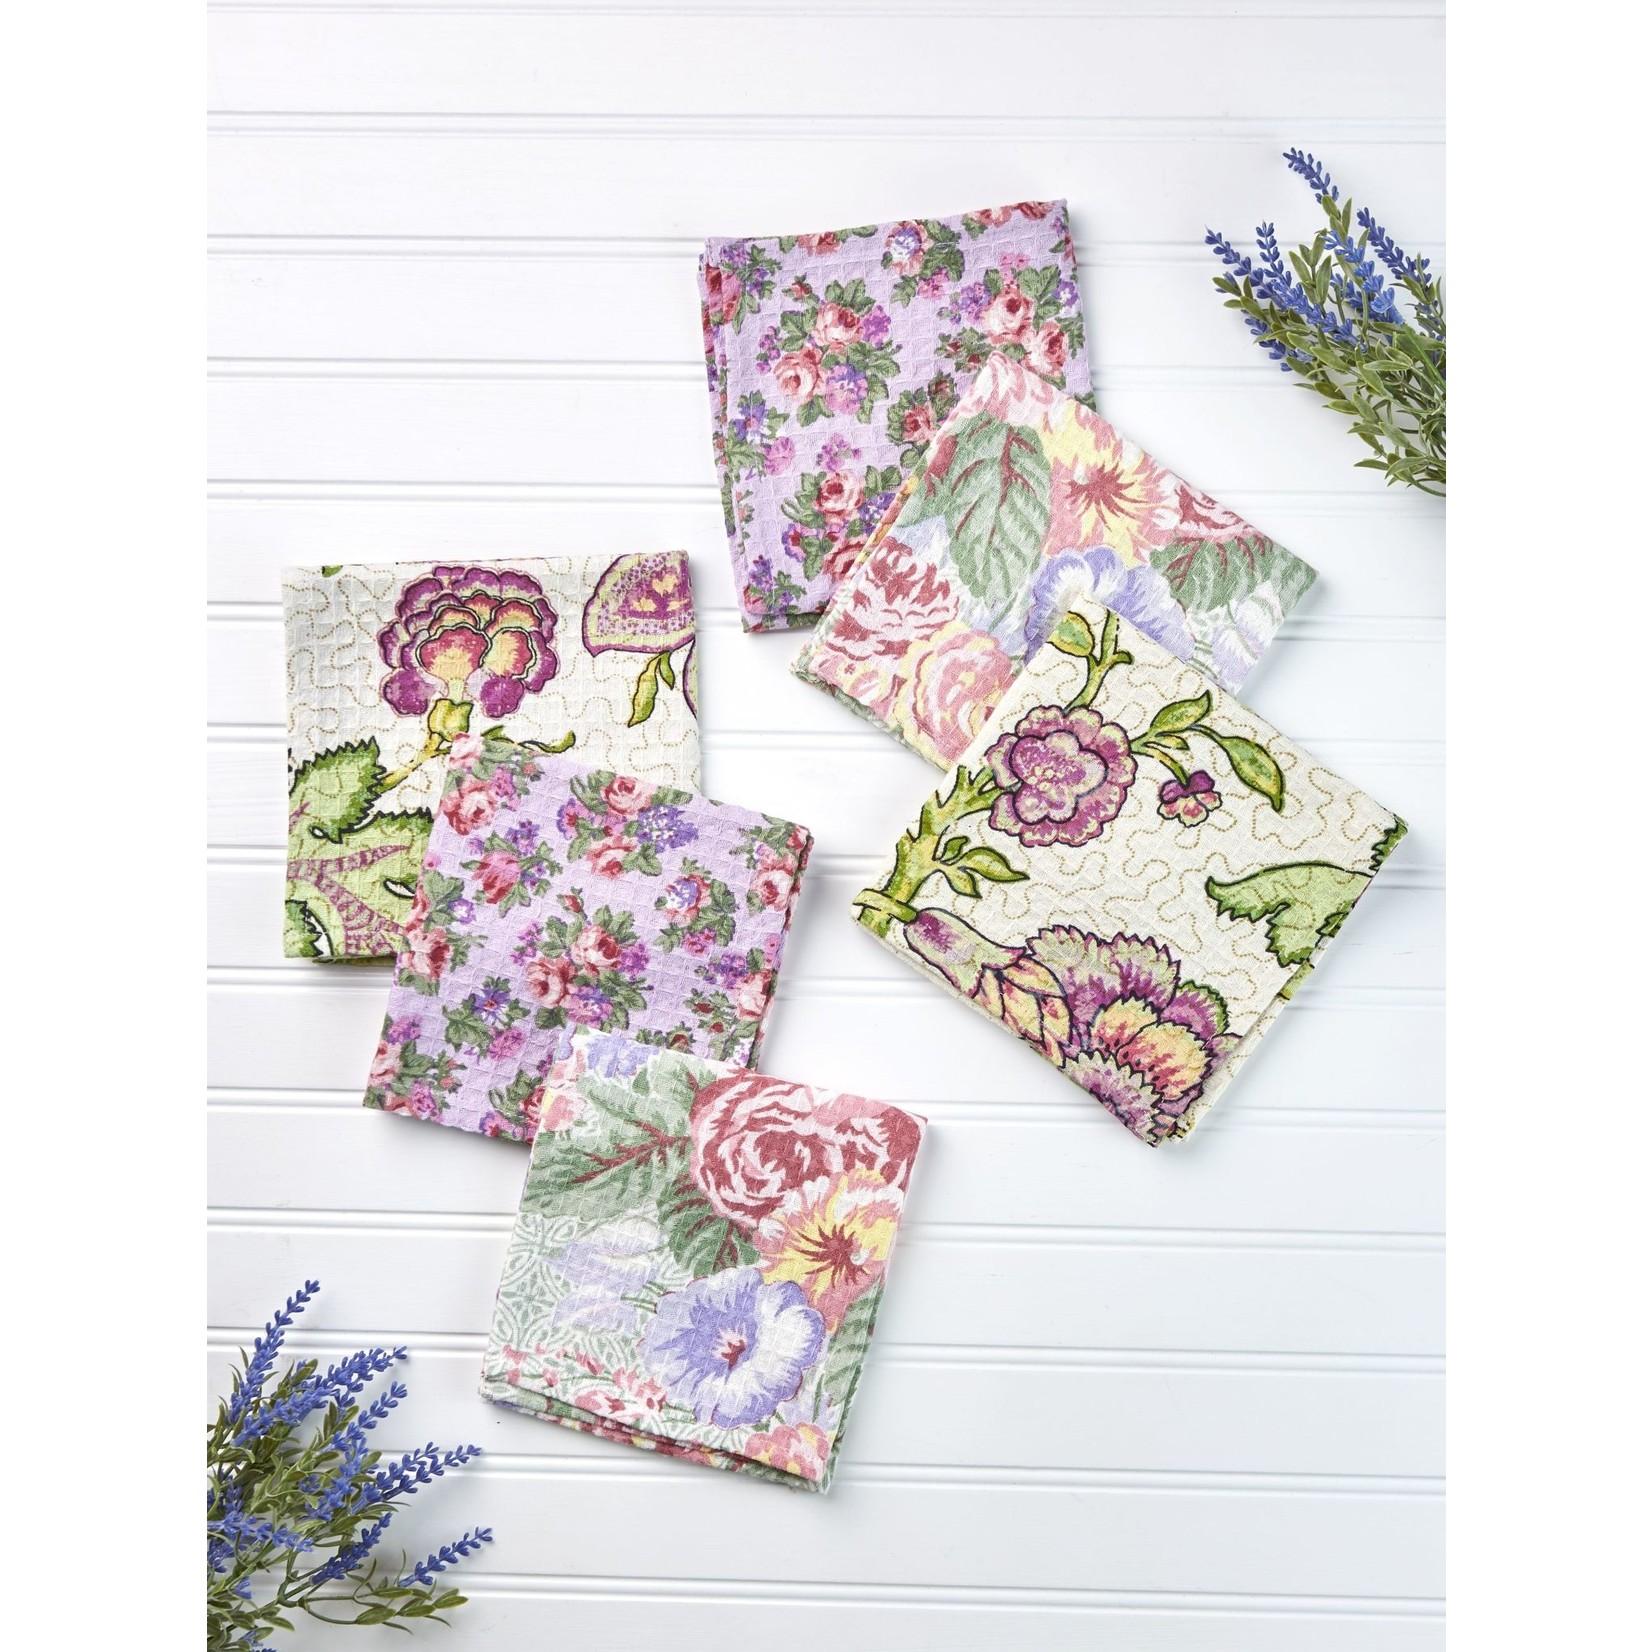 April Cornell Tea Garden Tiny Towel